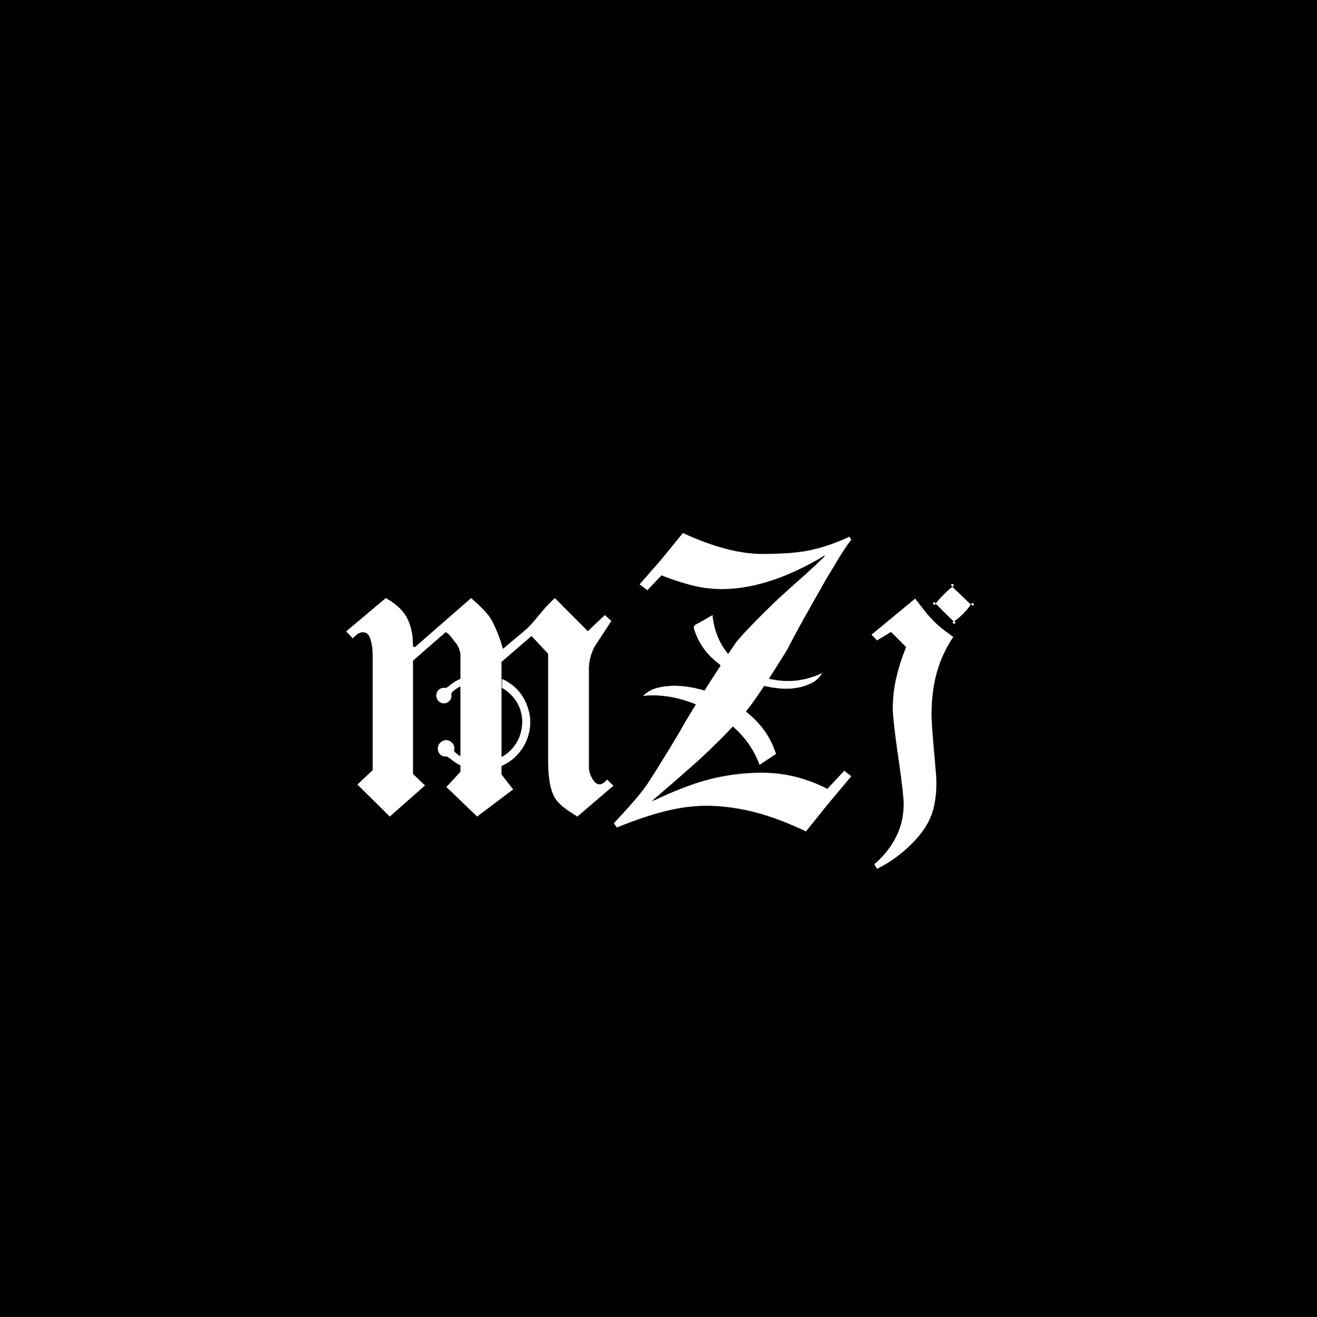 MaZij